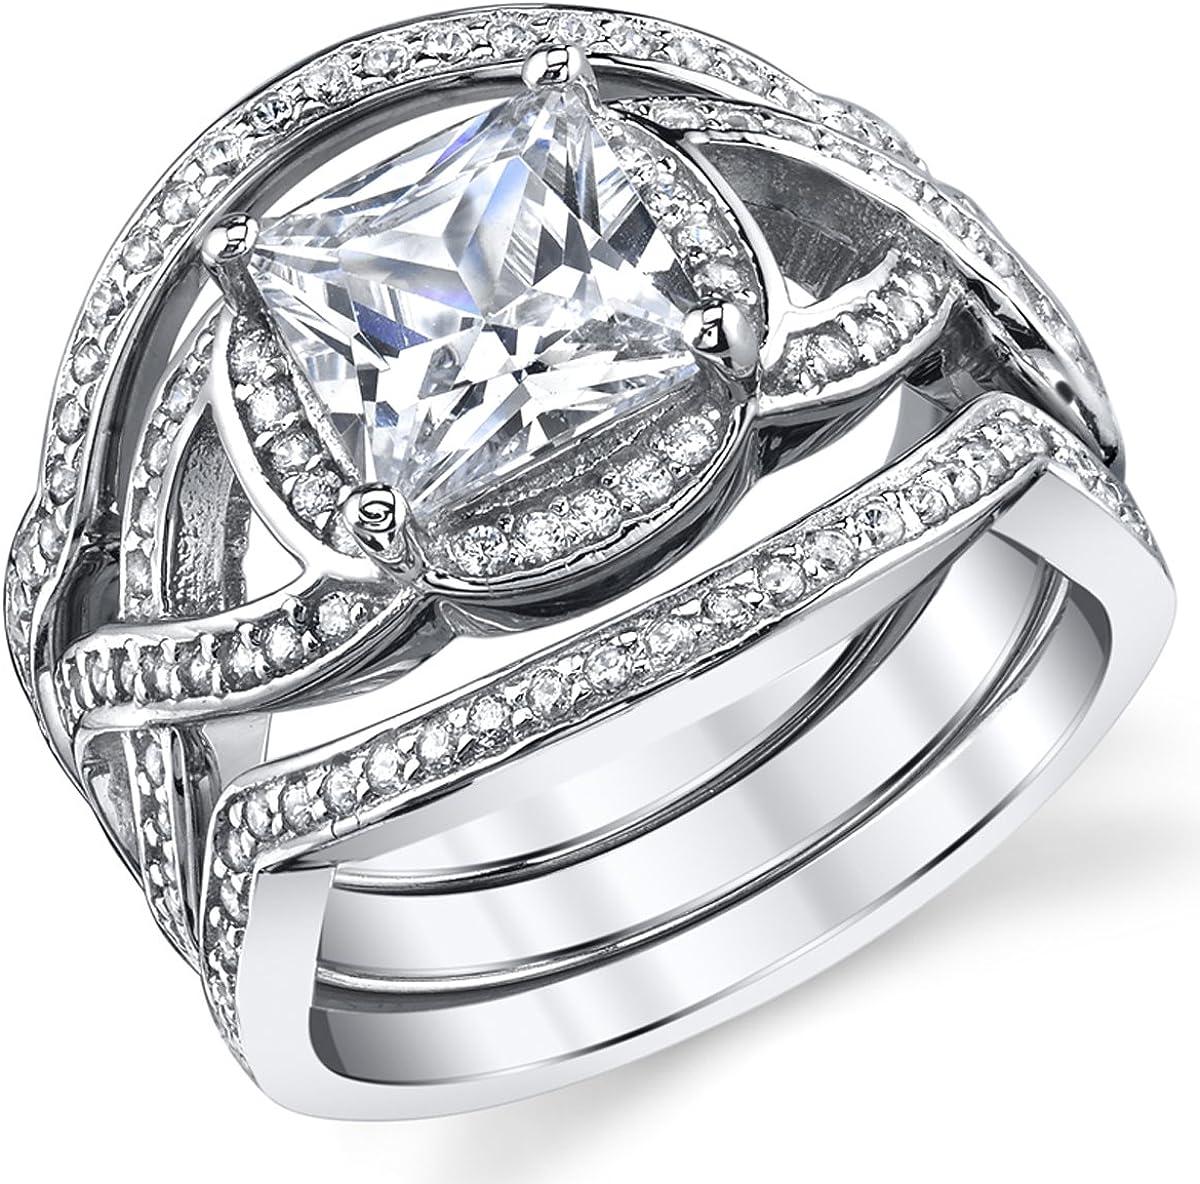 3 Piece Sterling Silver Engagement Nippon regular agency Ring Bridal set Philadelphia Mall 2 Bands W C